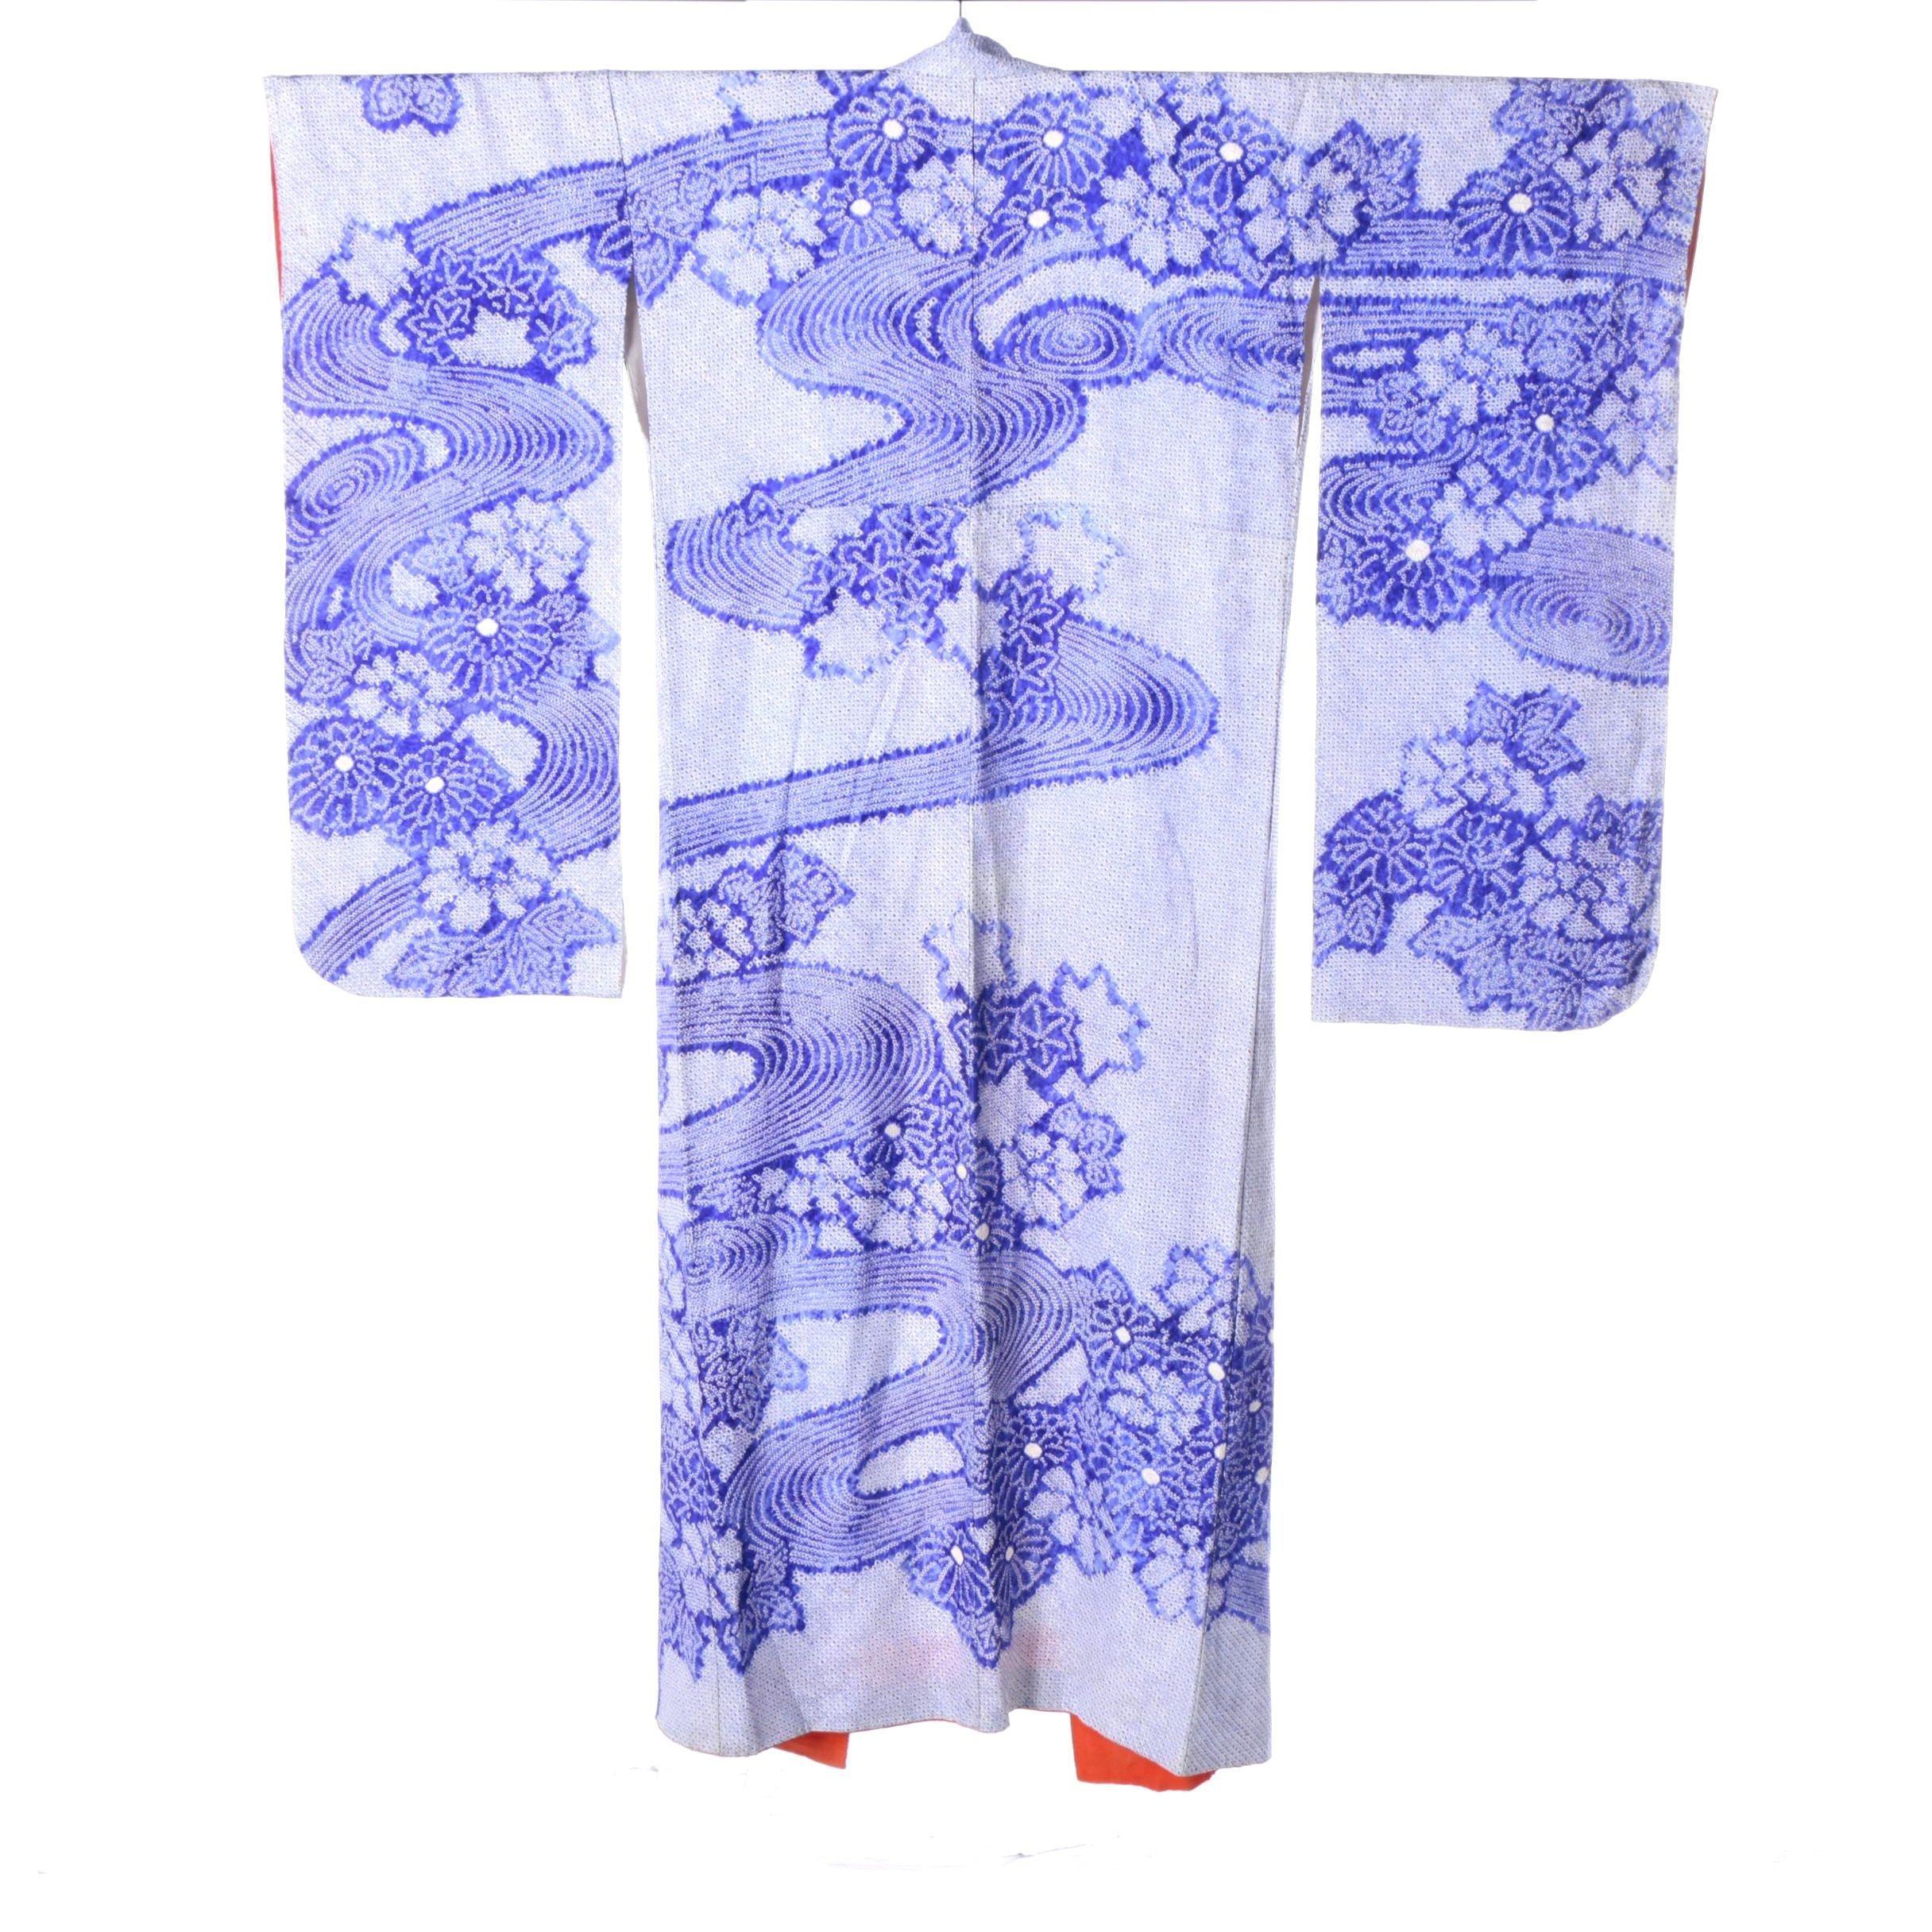 Circa 1940s Vintage Japanese Shiburi Dyed Silk Furisode Kimono